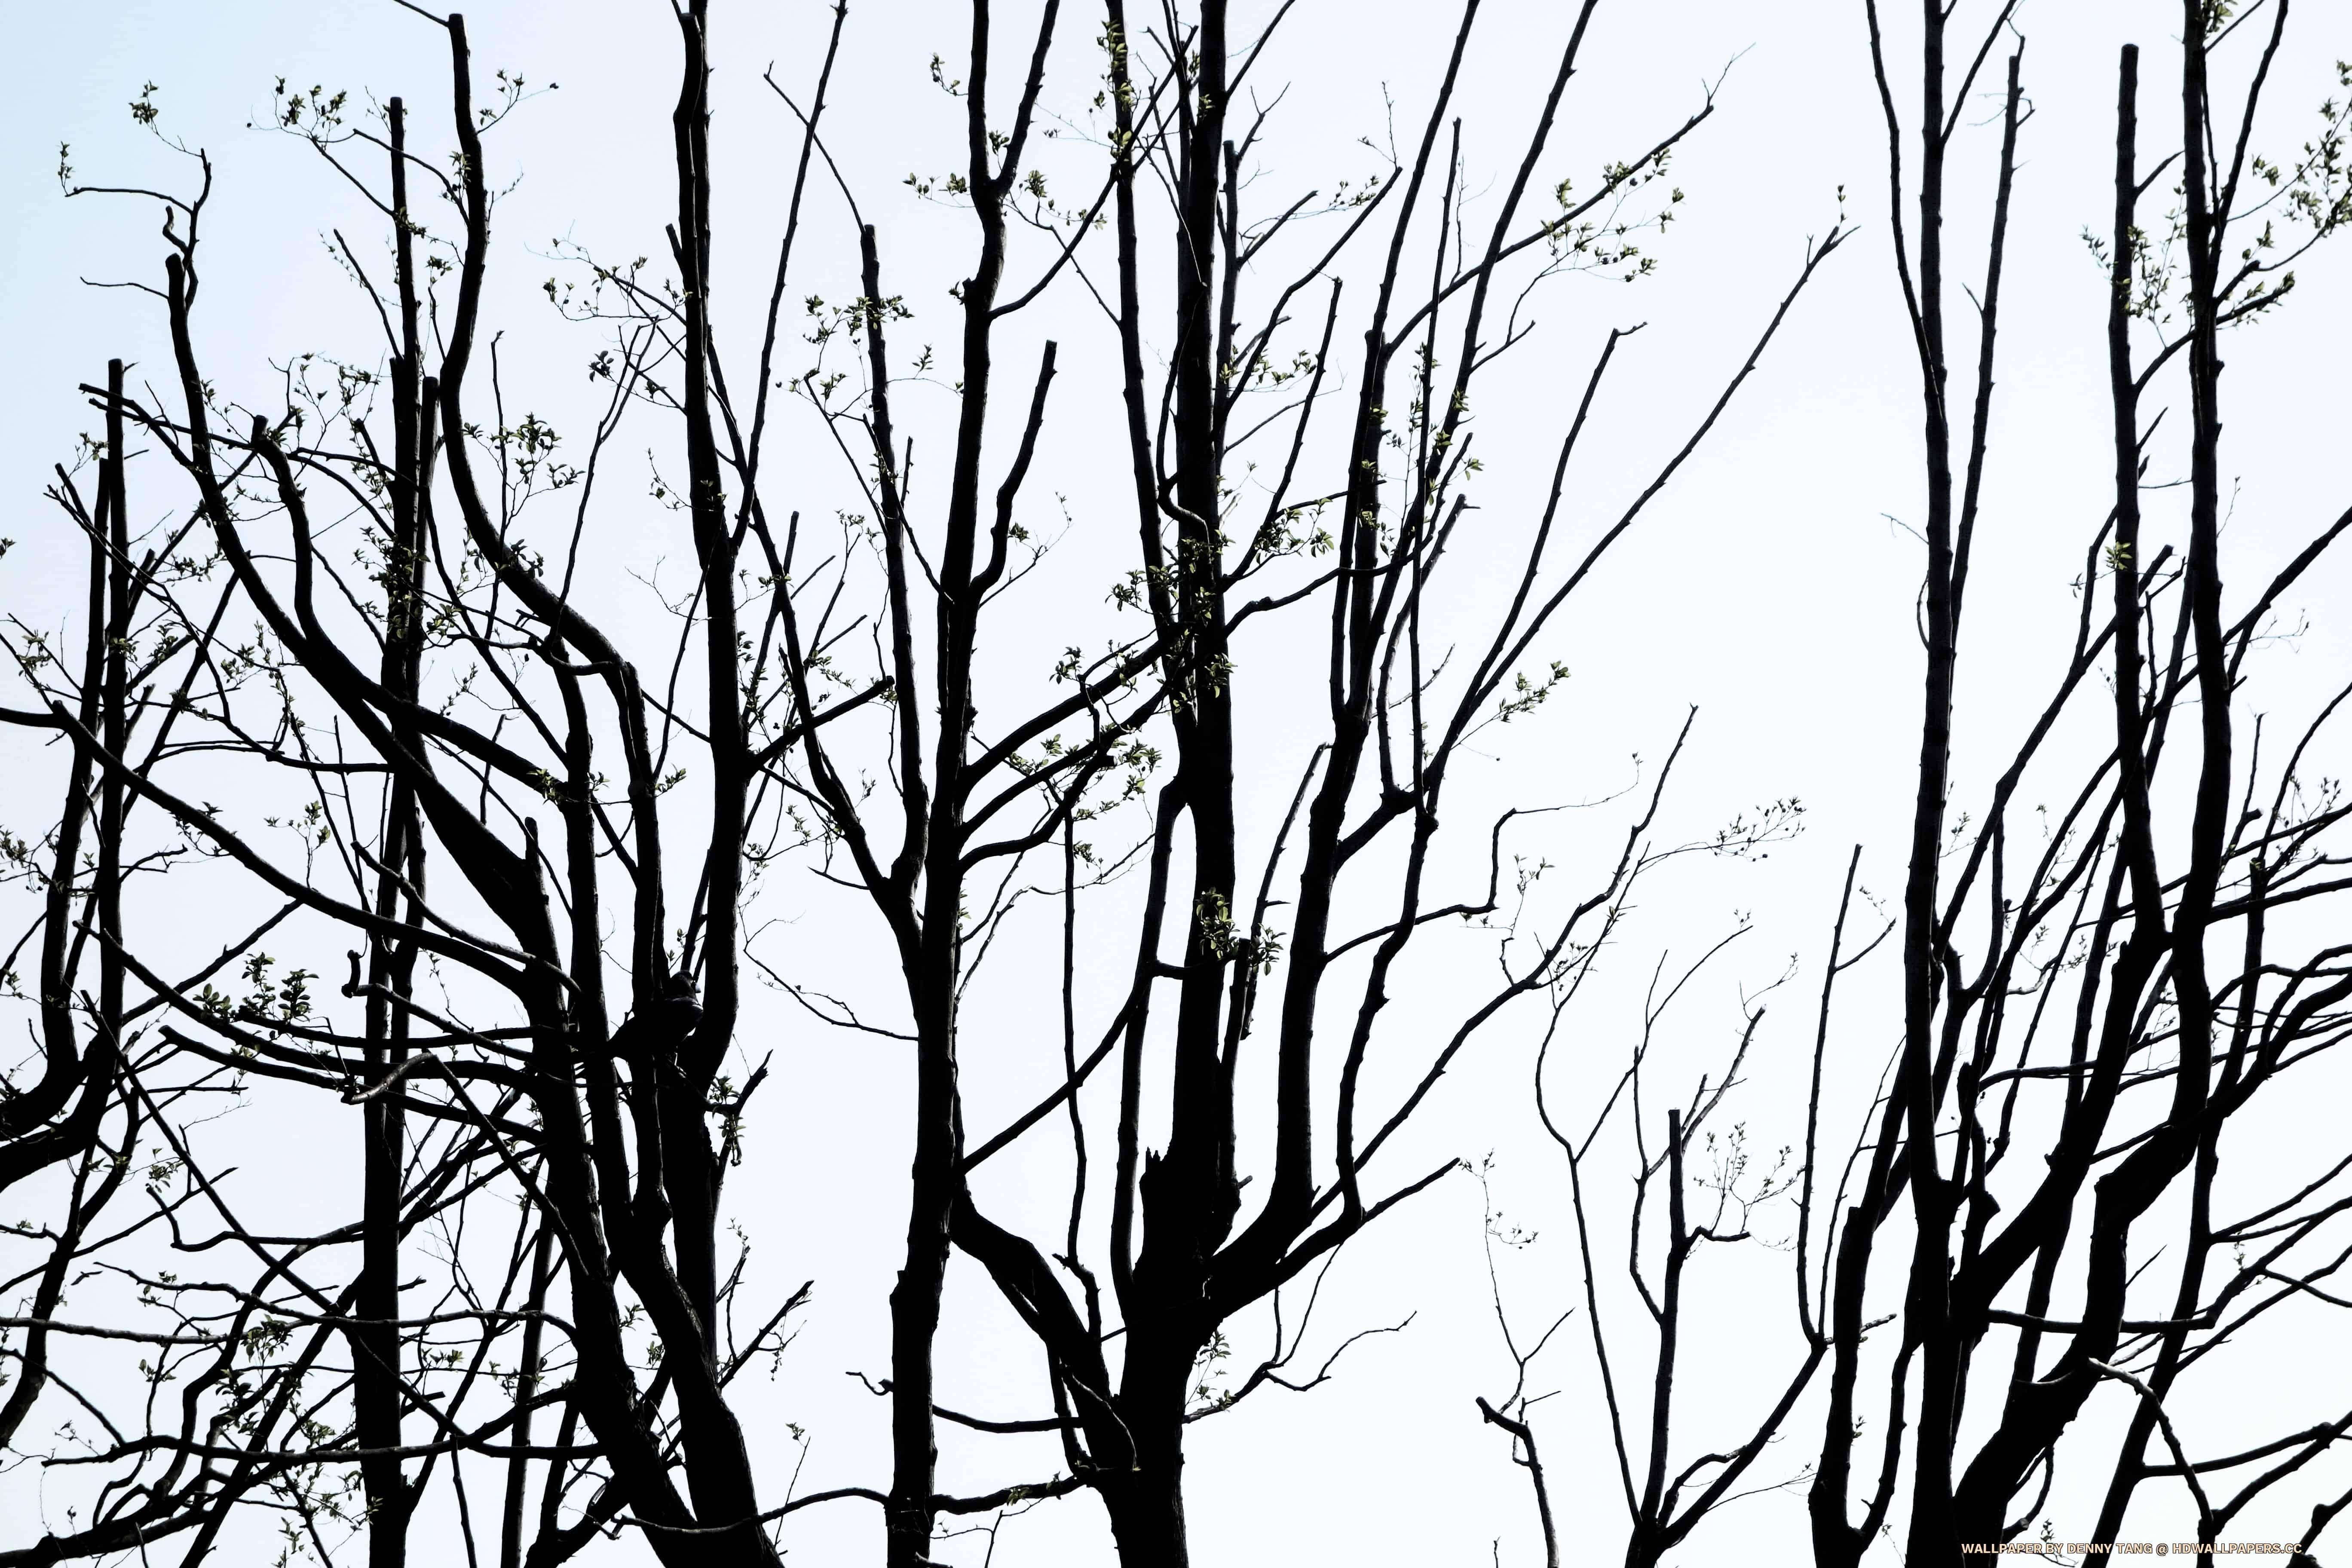 branches hd wallpapers HD Landscape Wallpaper 1920X1080 5k 5120px